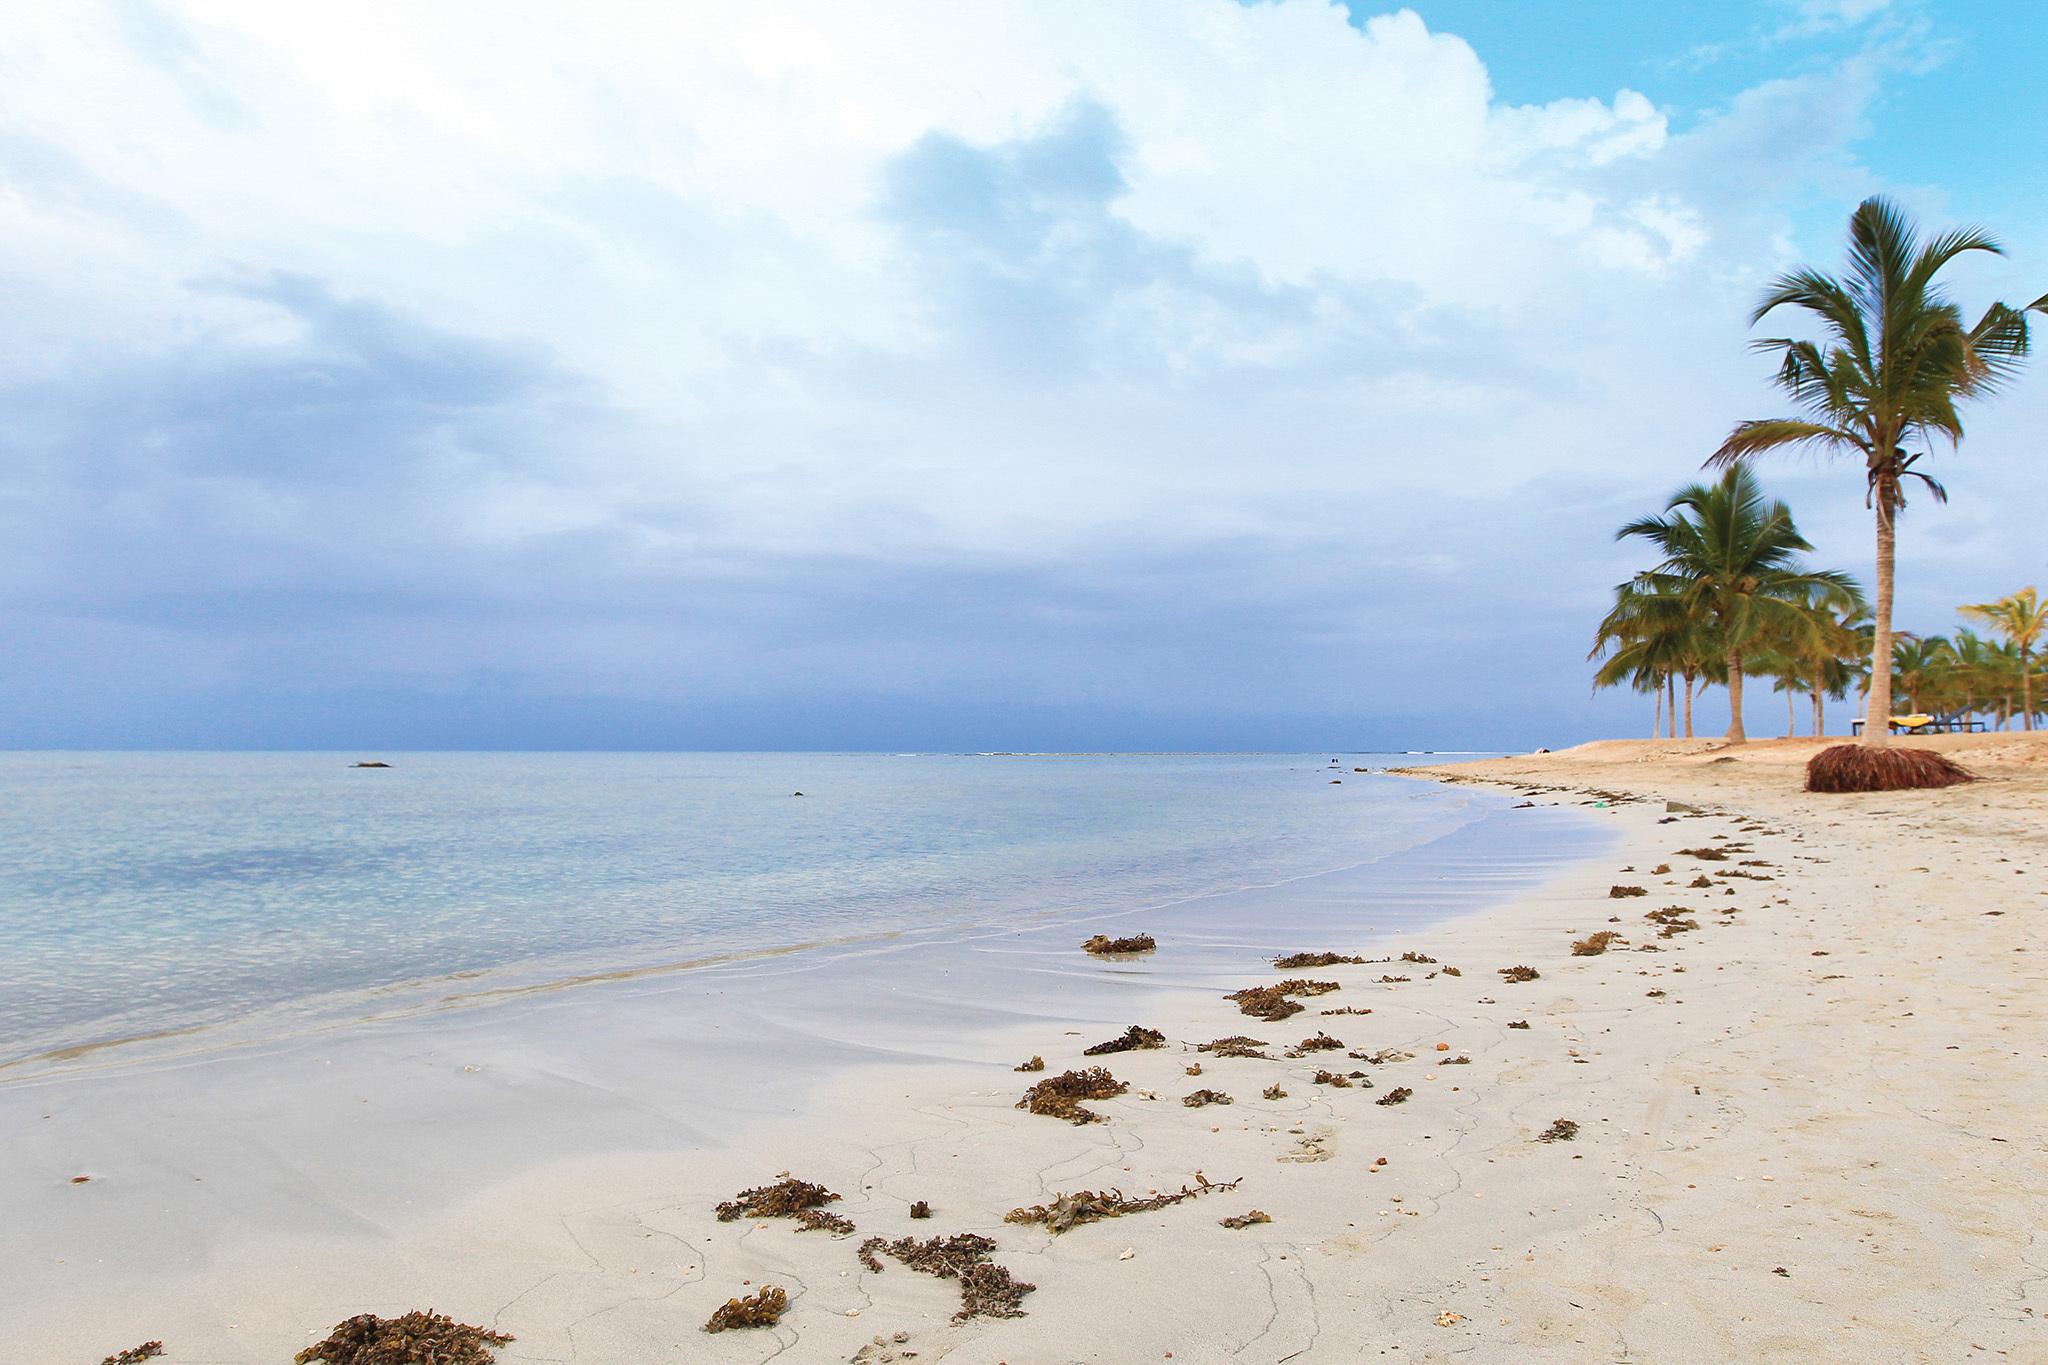 The best beaches in Sri Lanka